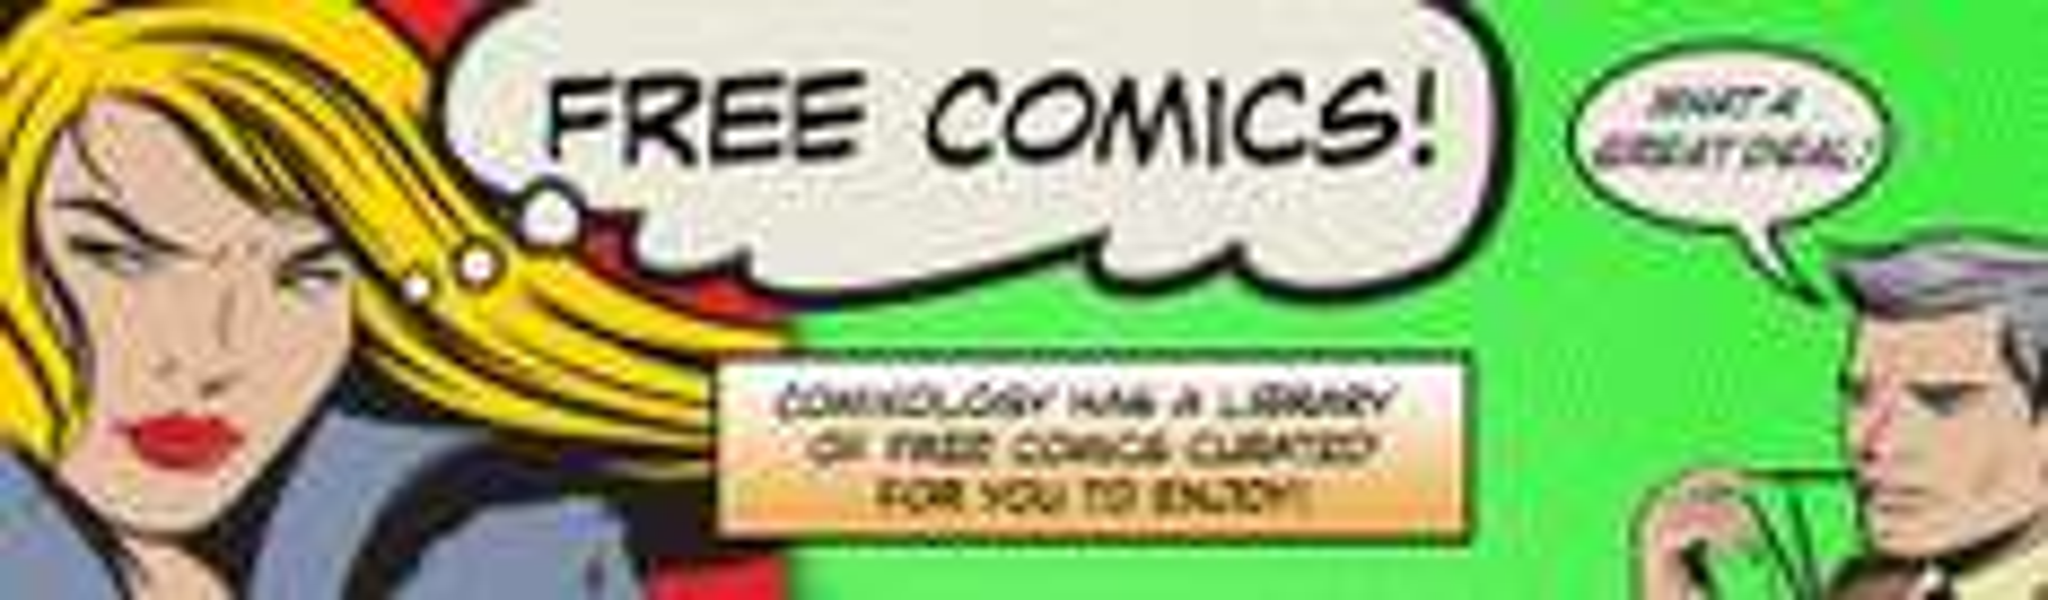 59 comics gratis en versión digital